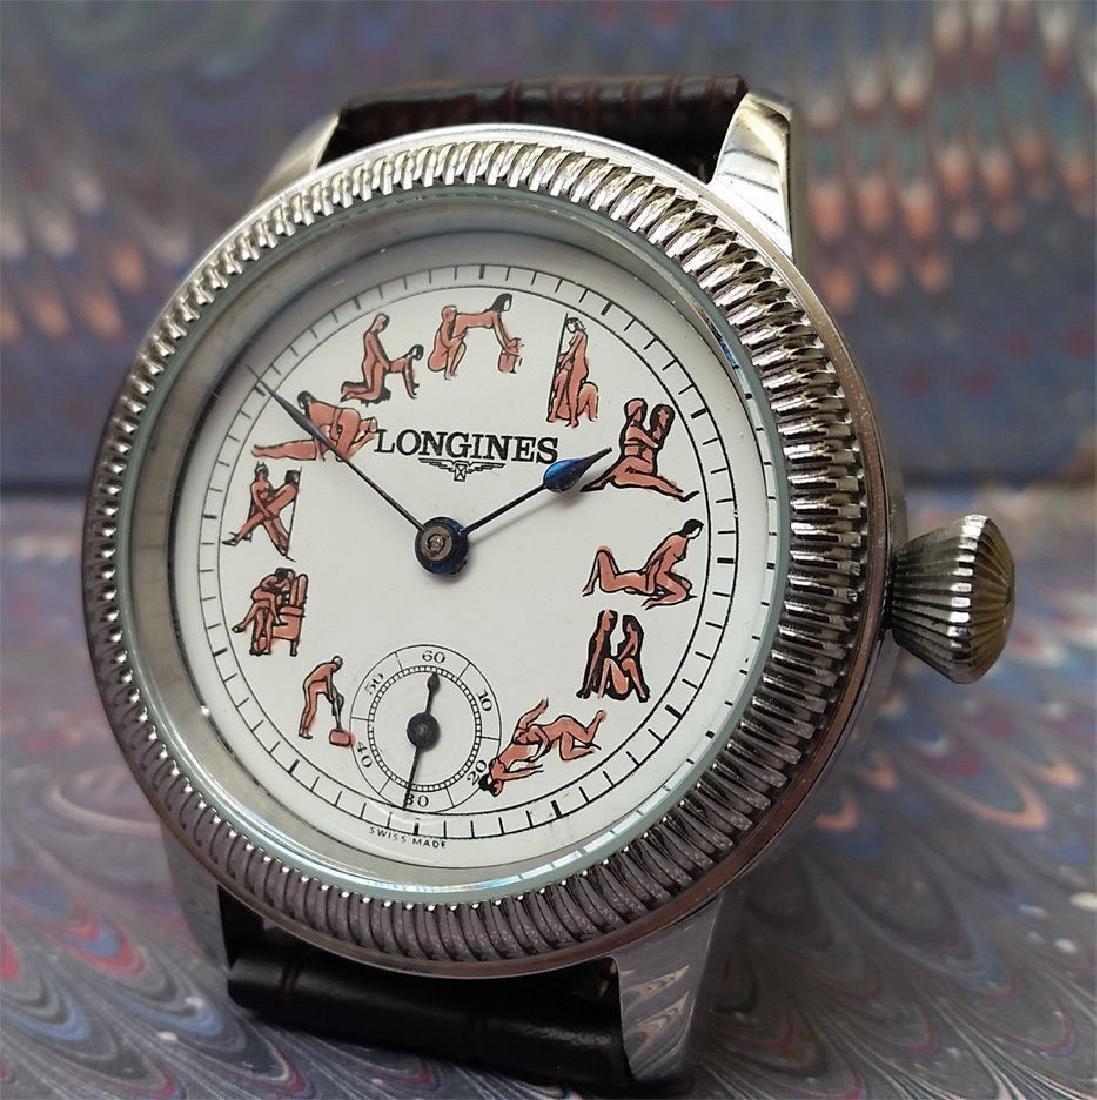 Vintage Longines Customized Kamasutra Dial Watch - 4